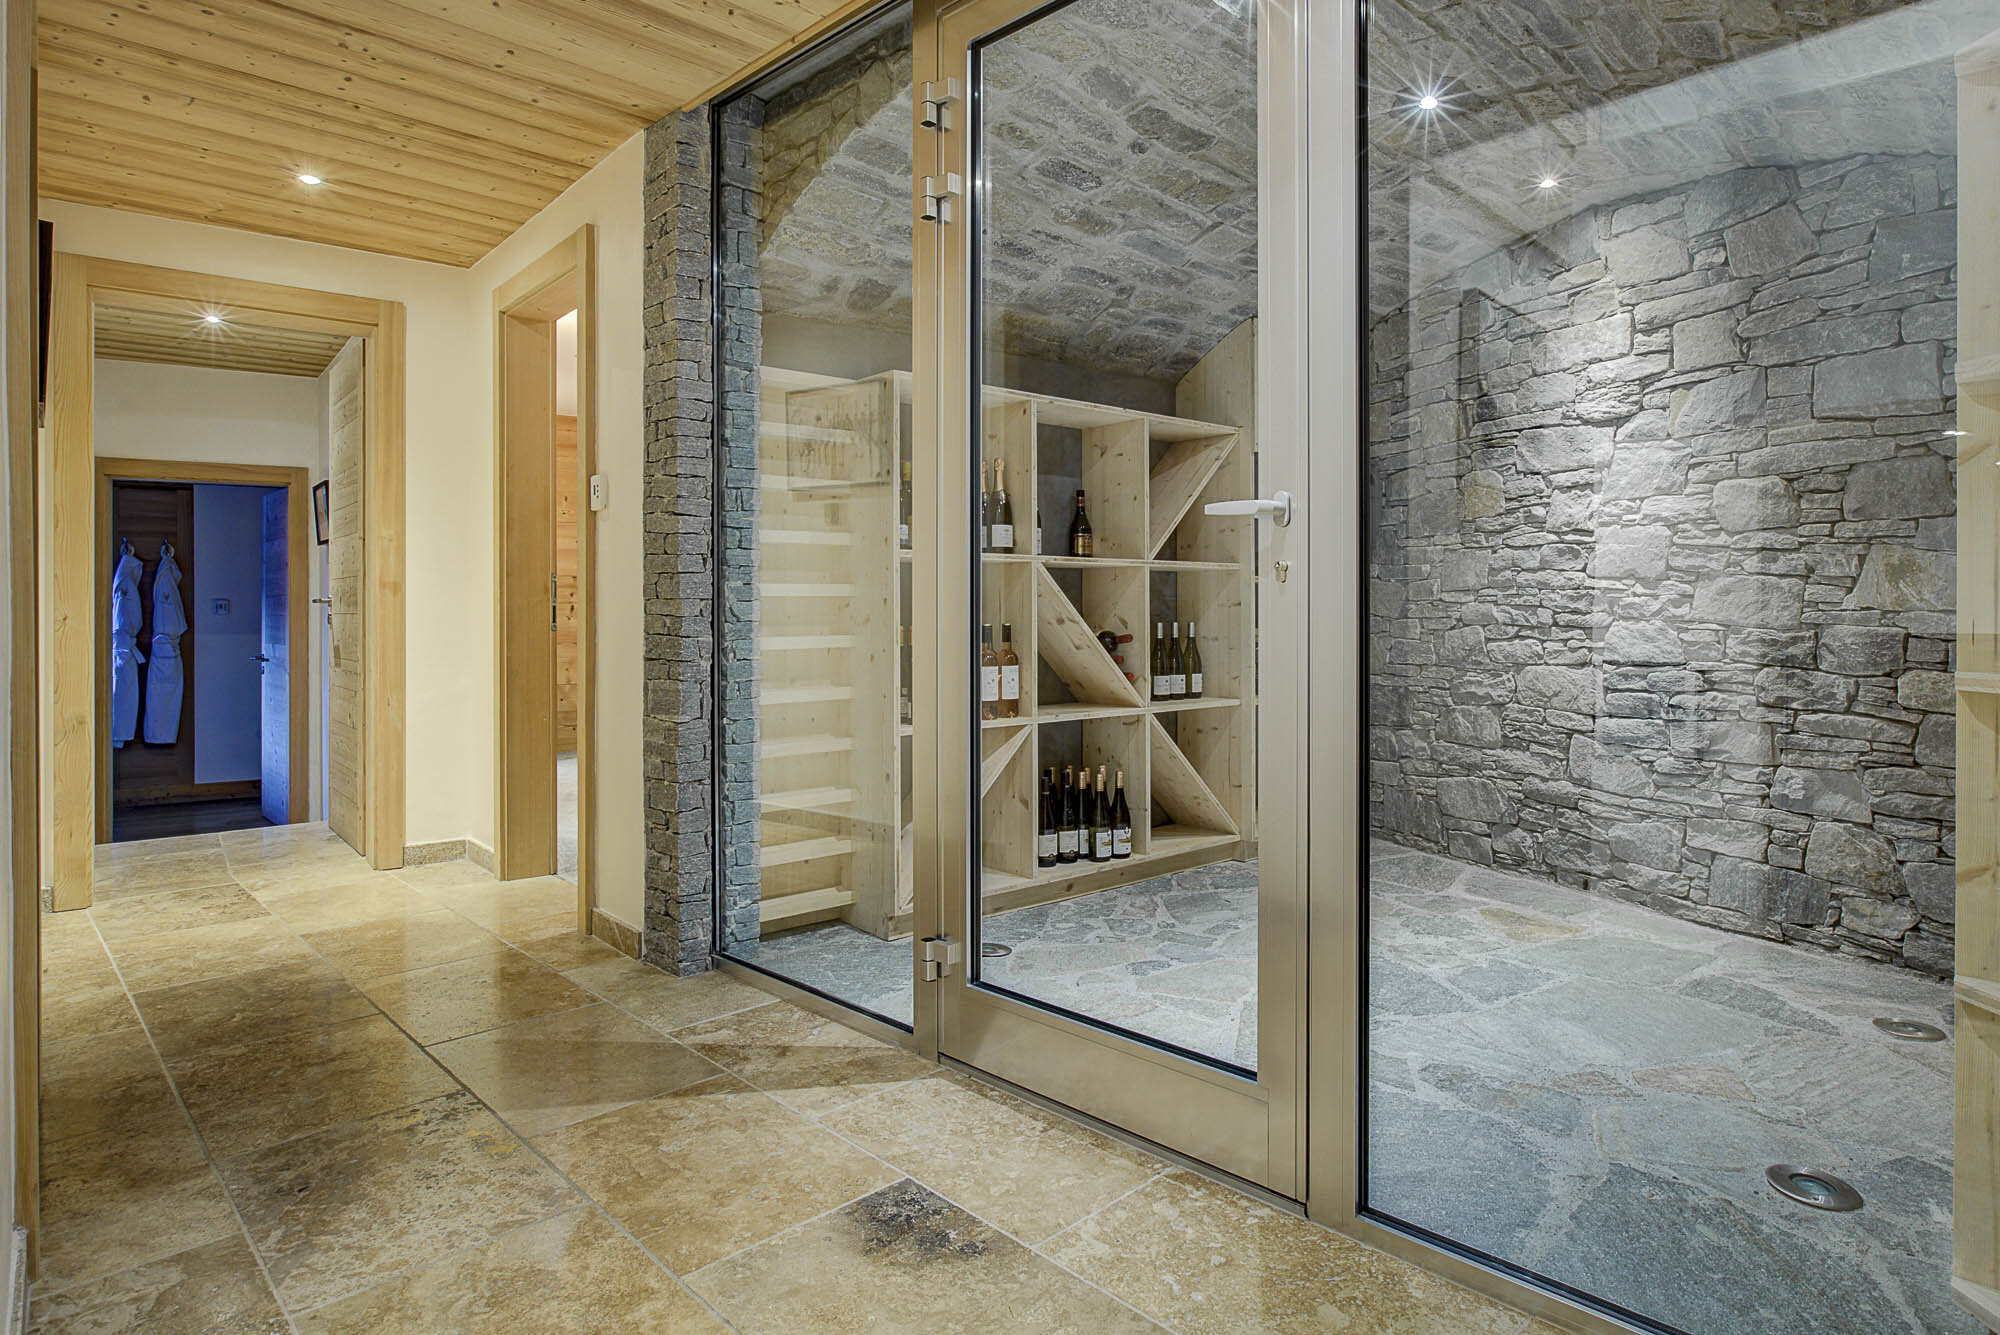 tg-ski-luxury-chalet-bouquetin-morzine-wine-cellar-013.jpg